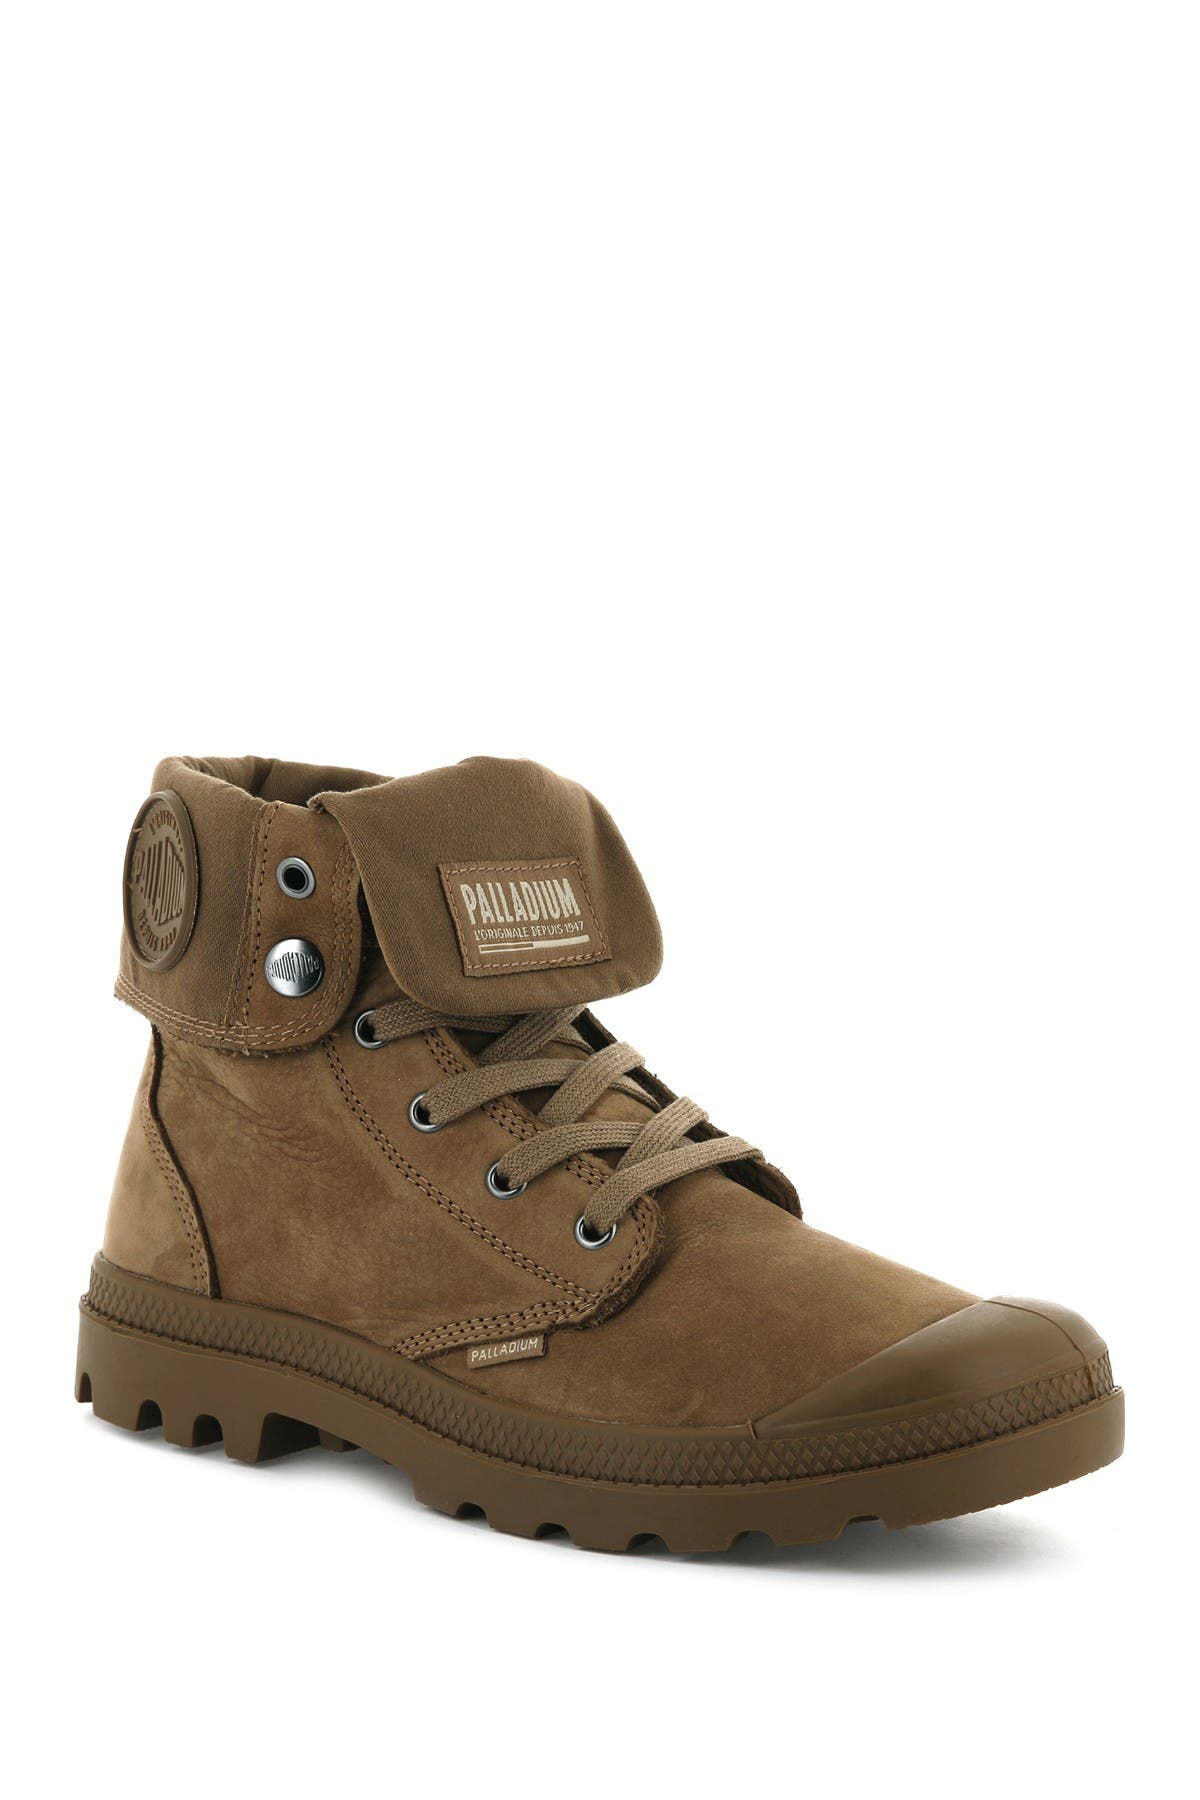 Image of PALLADIUM Pampa Baggy Folded Cuff Sneaker Boot